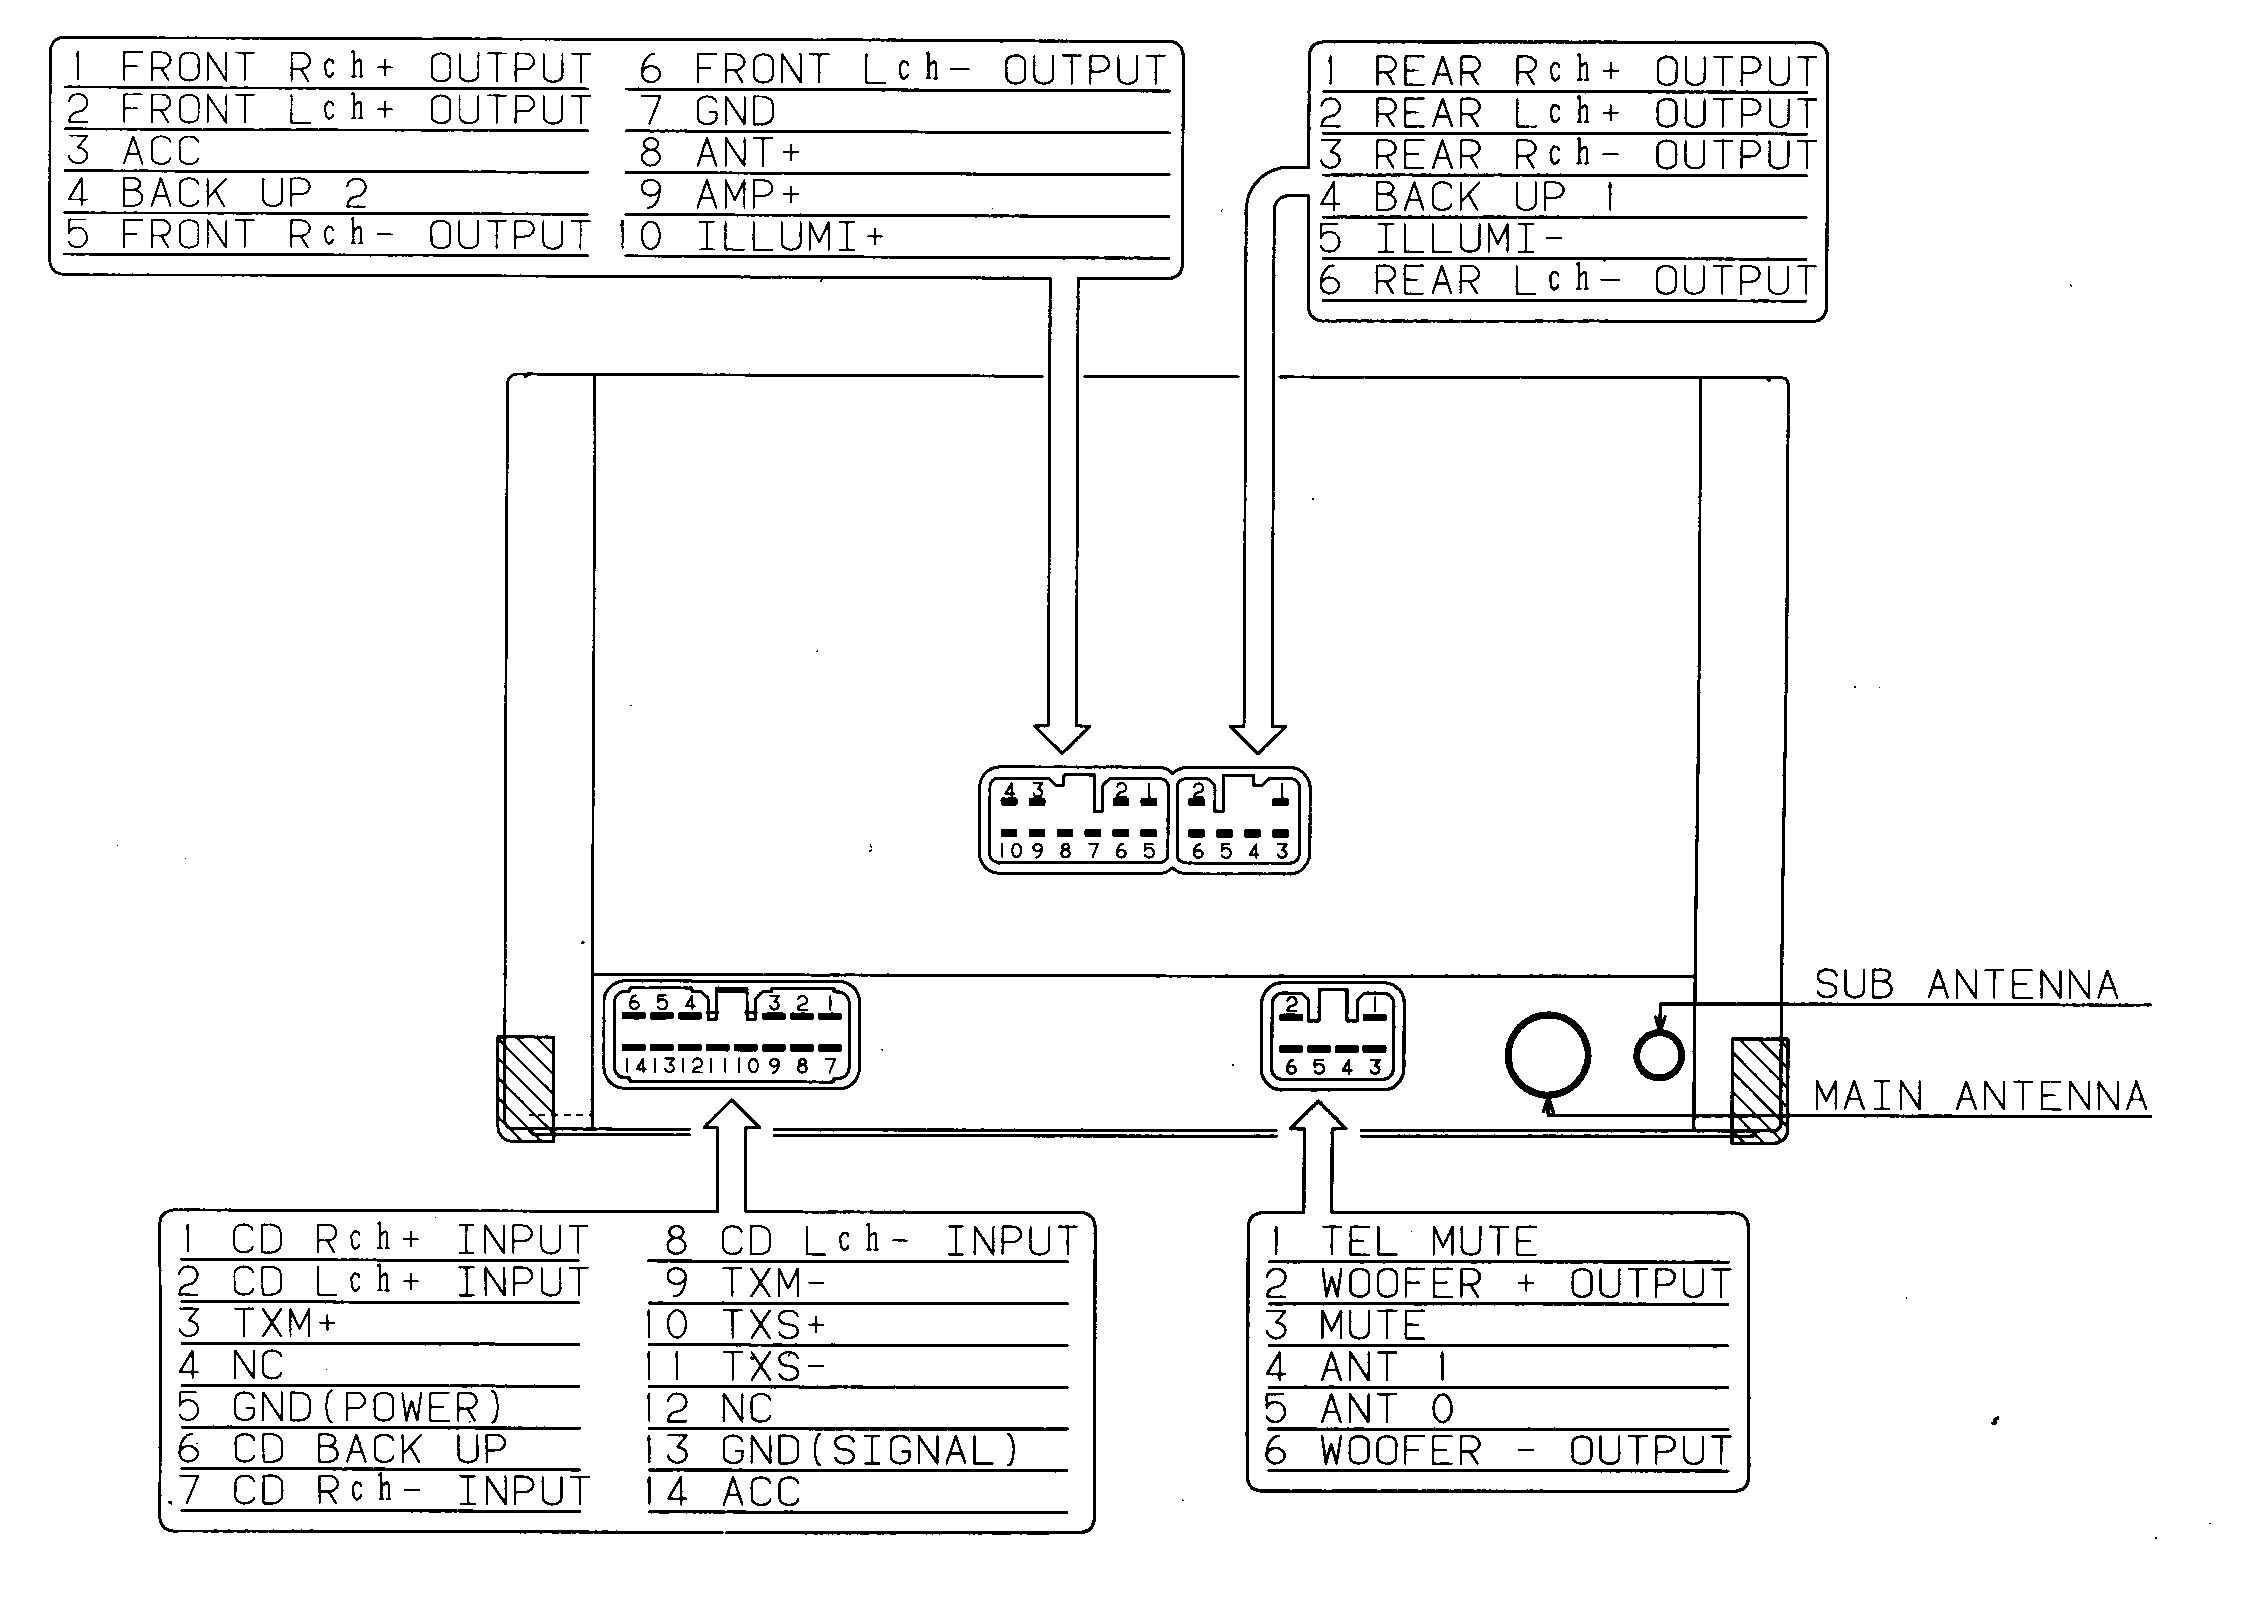 Jvc Car Stereo Wiring Diagram Inspirational Jvc Wiring Schematic Wiring Diagram